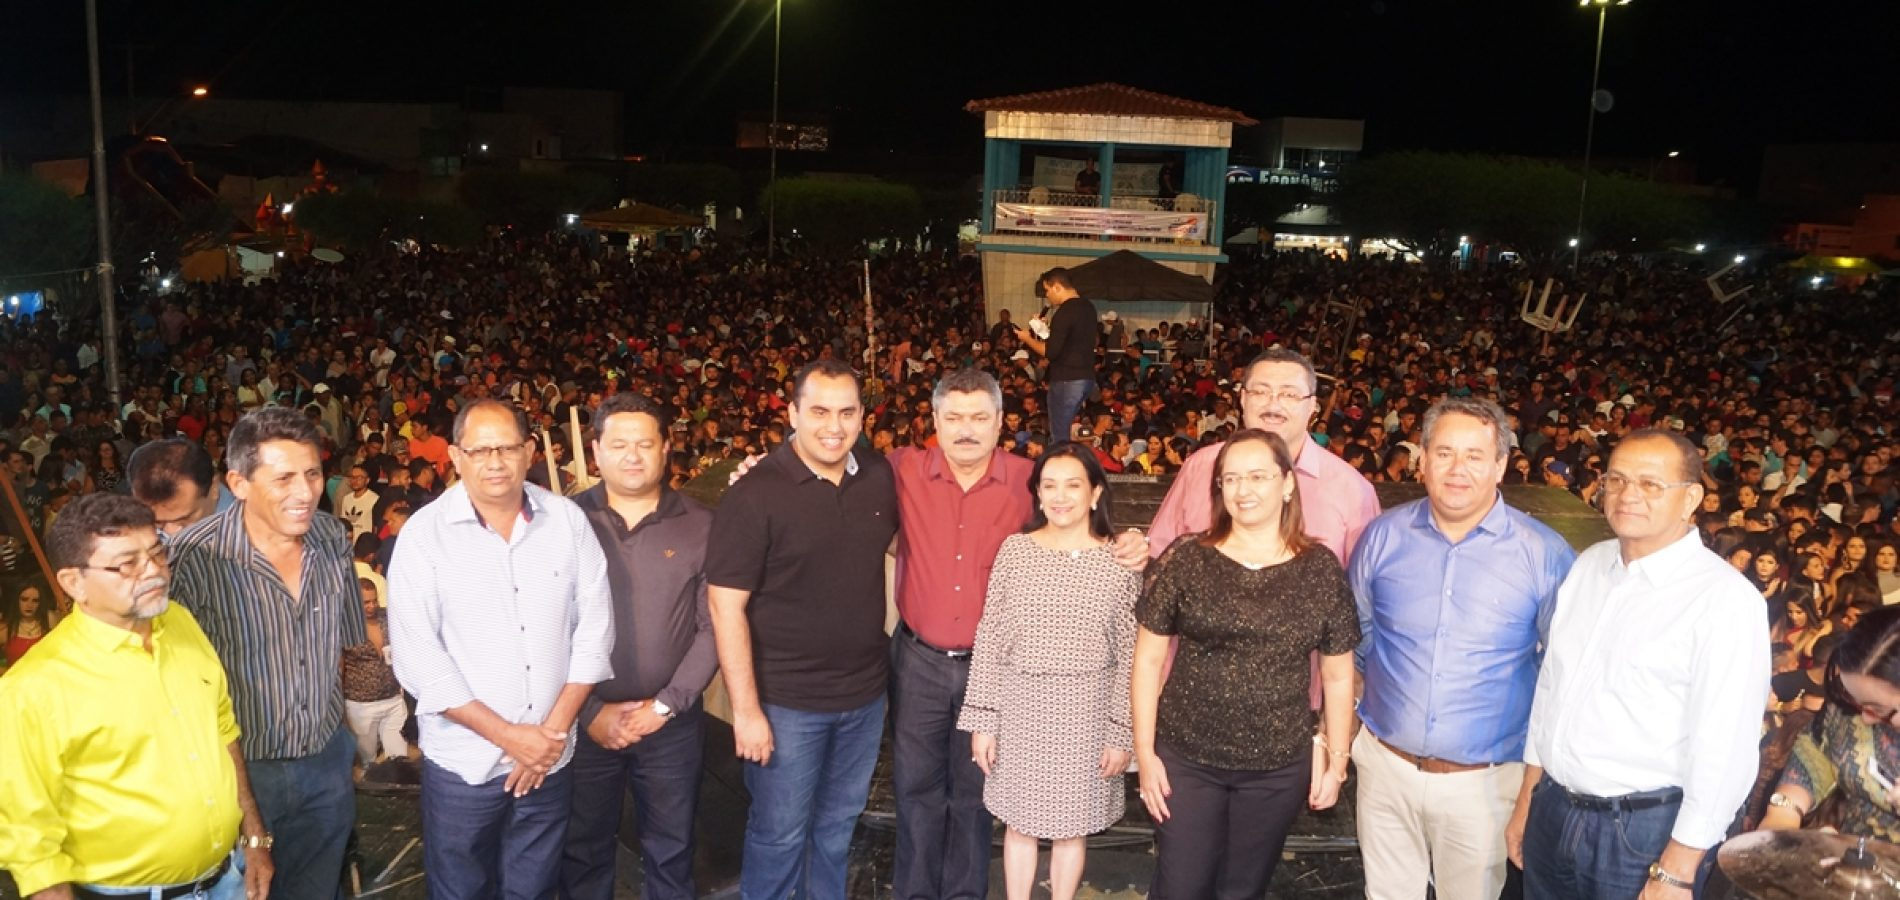 FOTOS | Shows de Luan Estilizado, Katia Cilene e Marlos do Acordeon no aniversário de Simões